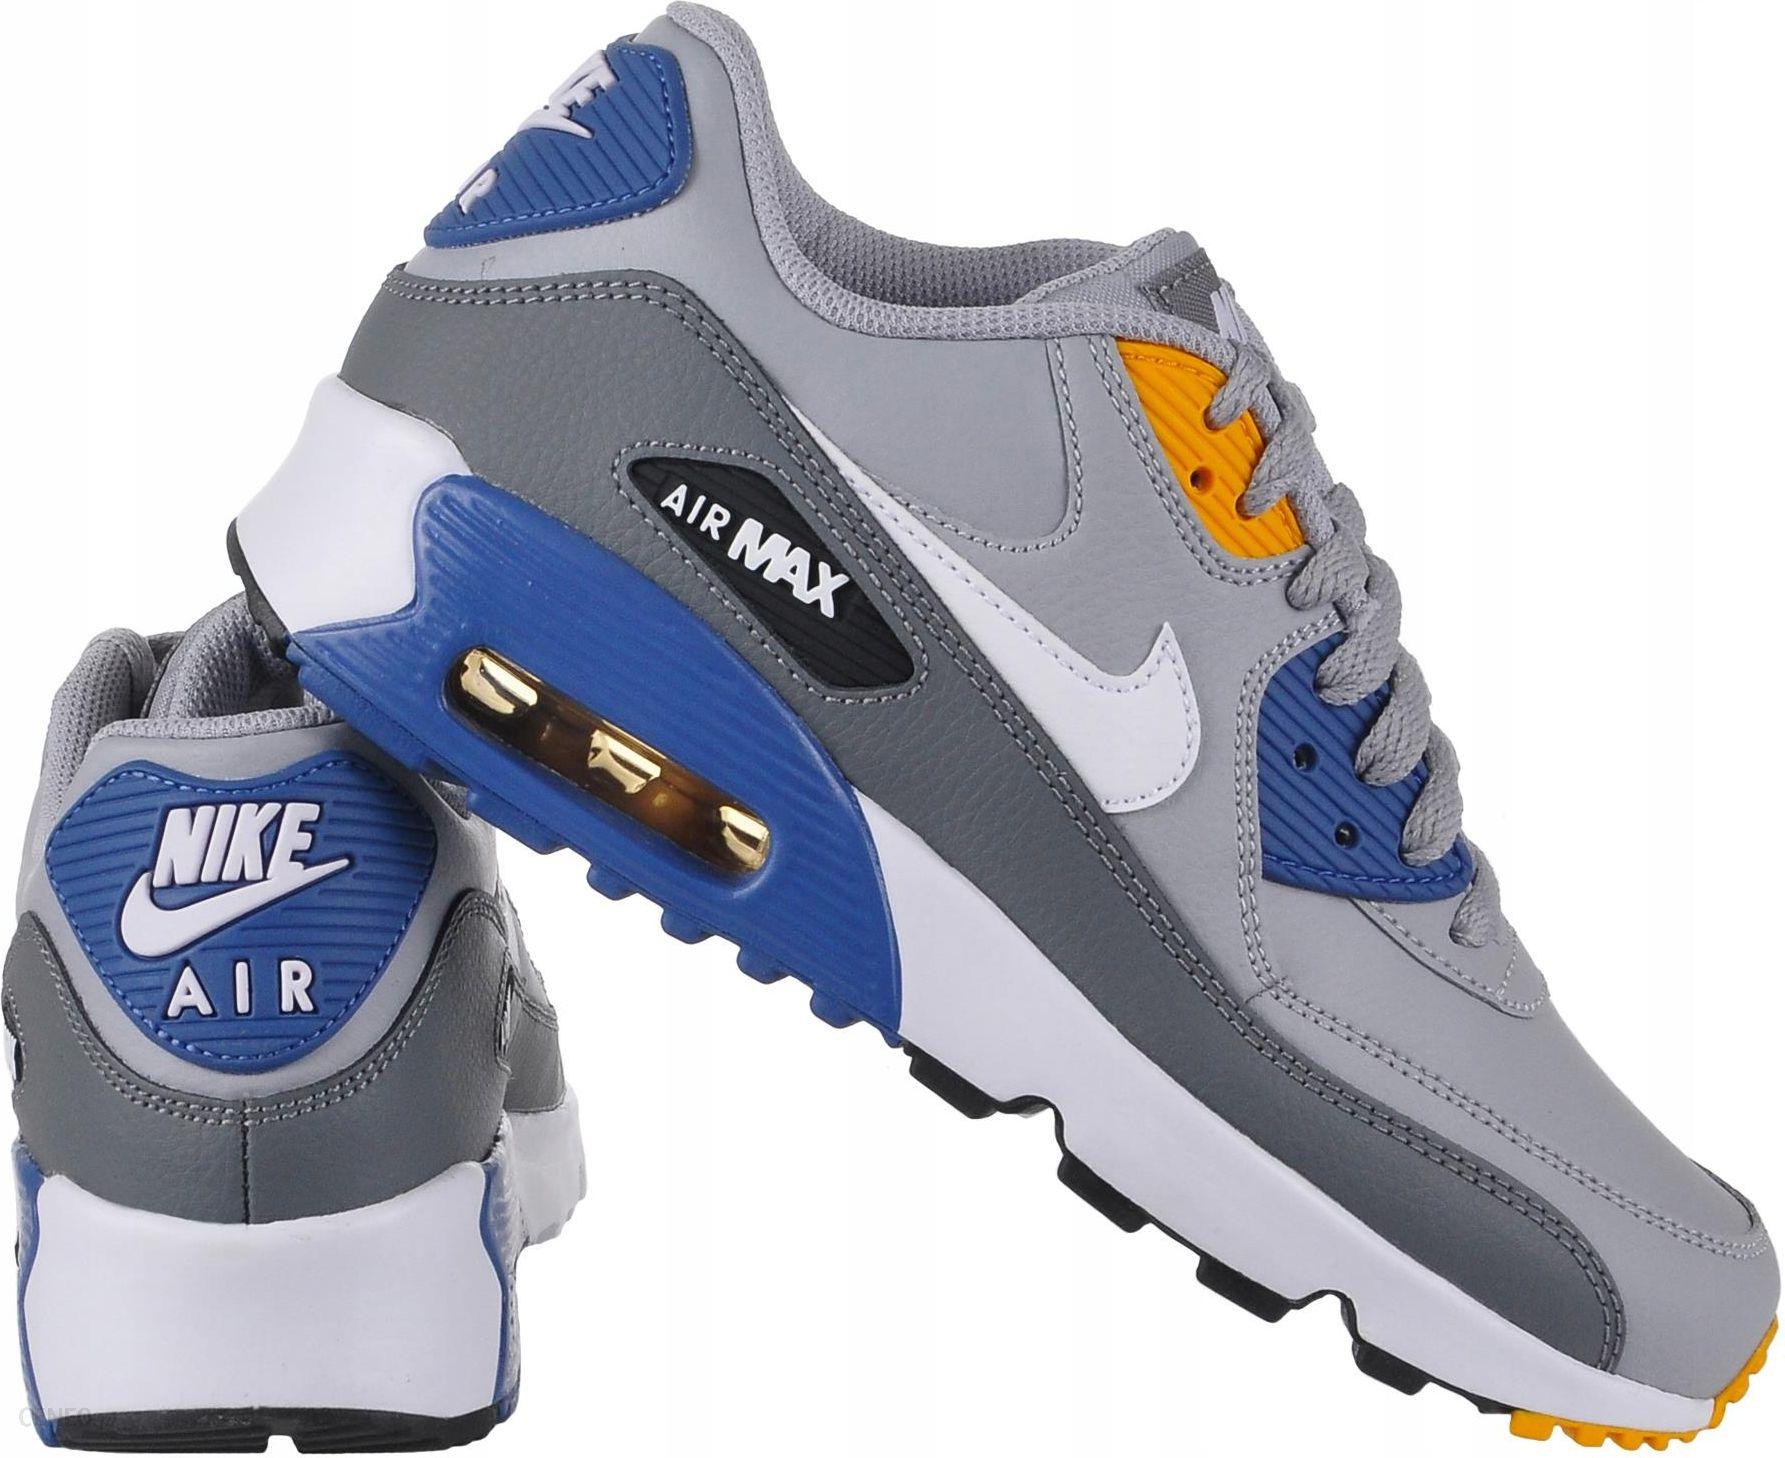 Buty Nike Air Max 90 Ltr Sneaker Skᄄᆴra r.40 Ceny i opinie Ceneo.pl